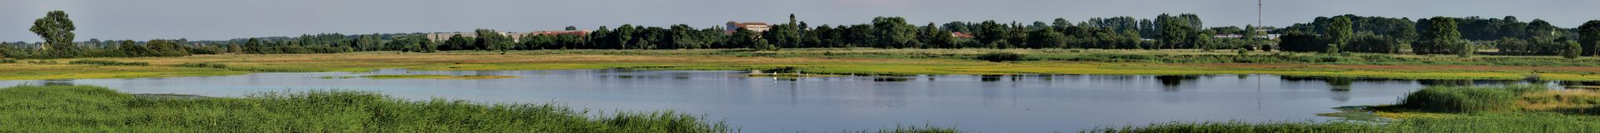 Sumpfgebiet-Panorama Lizenzfreie Stockfotos